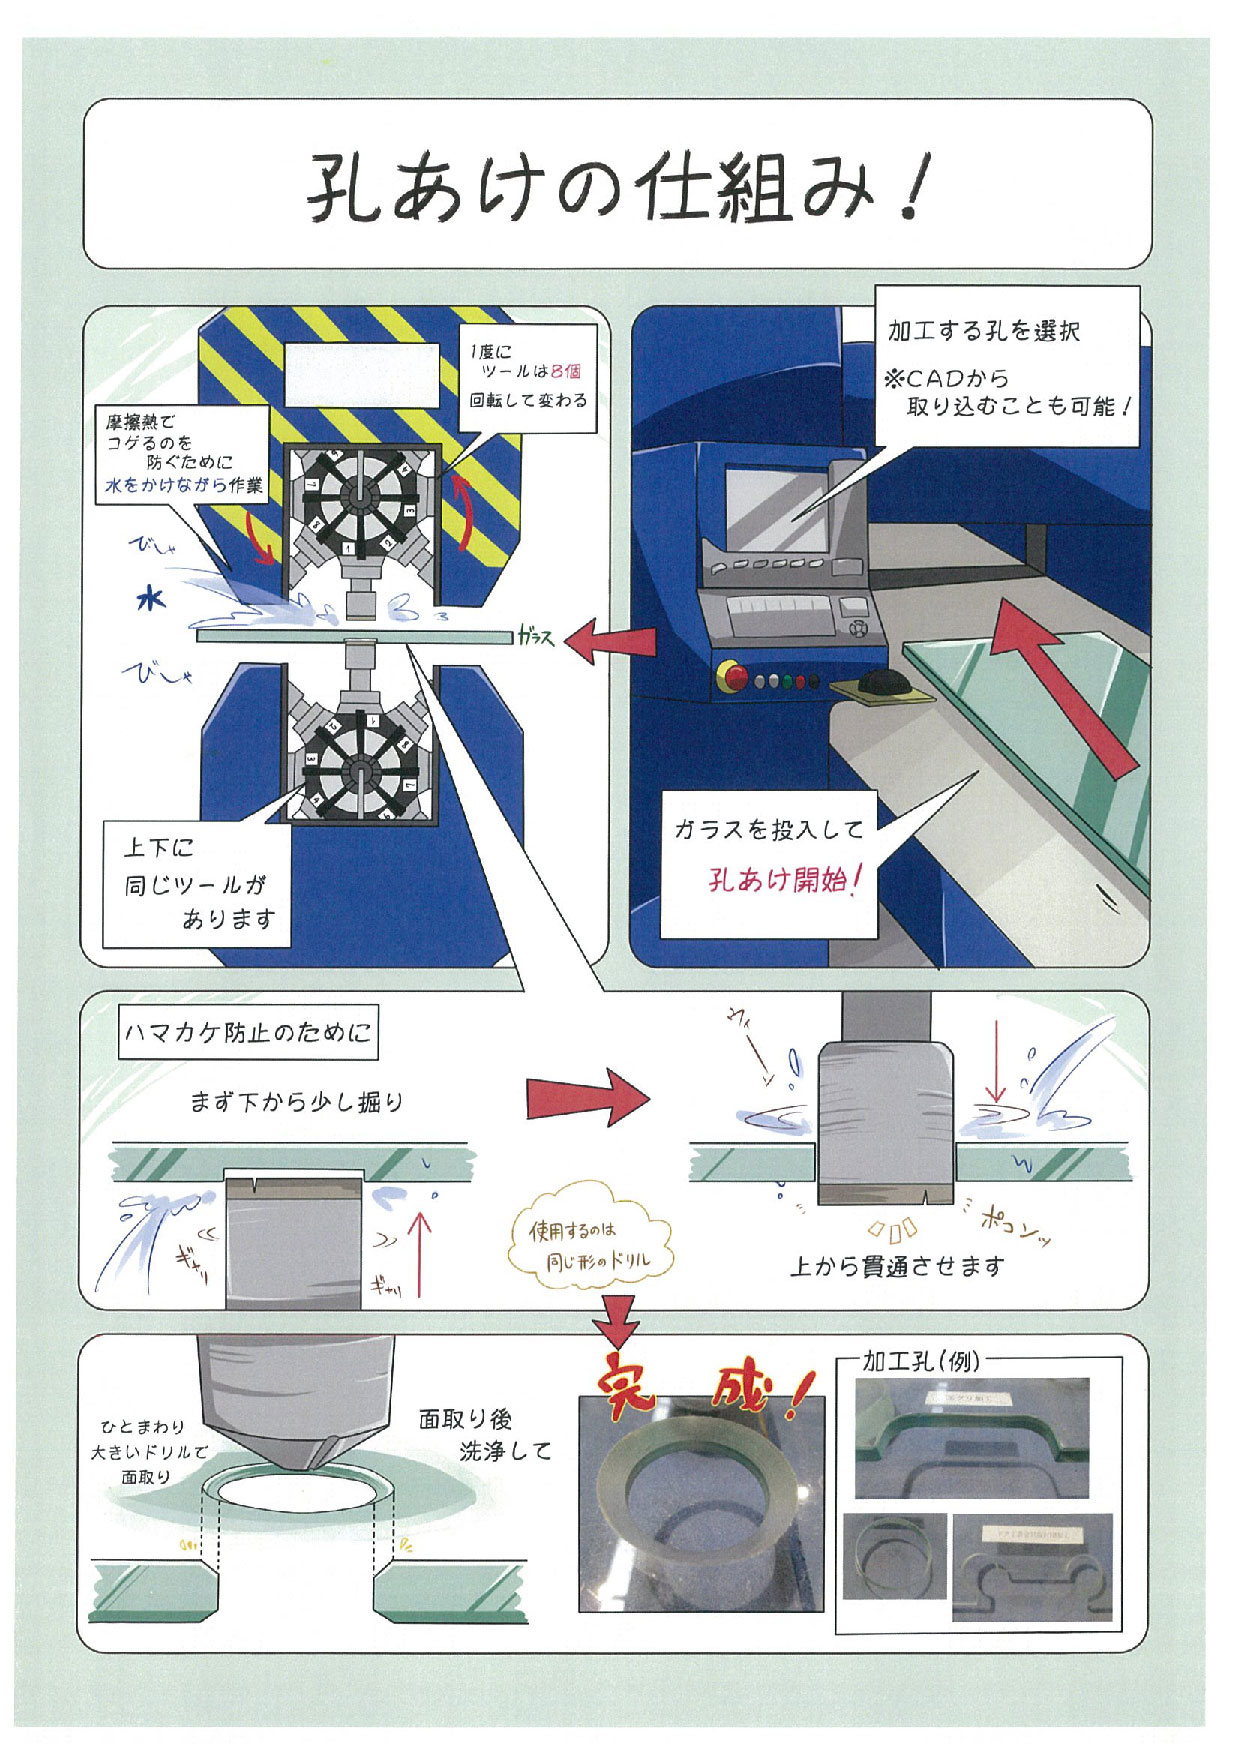 https://www.sanshiba-g.co.jp/images/setubi/Hole.jpg